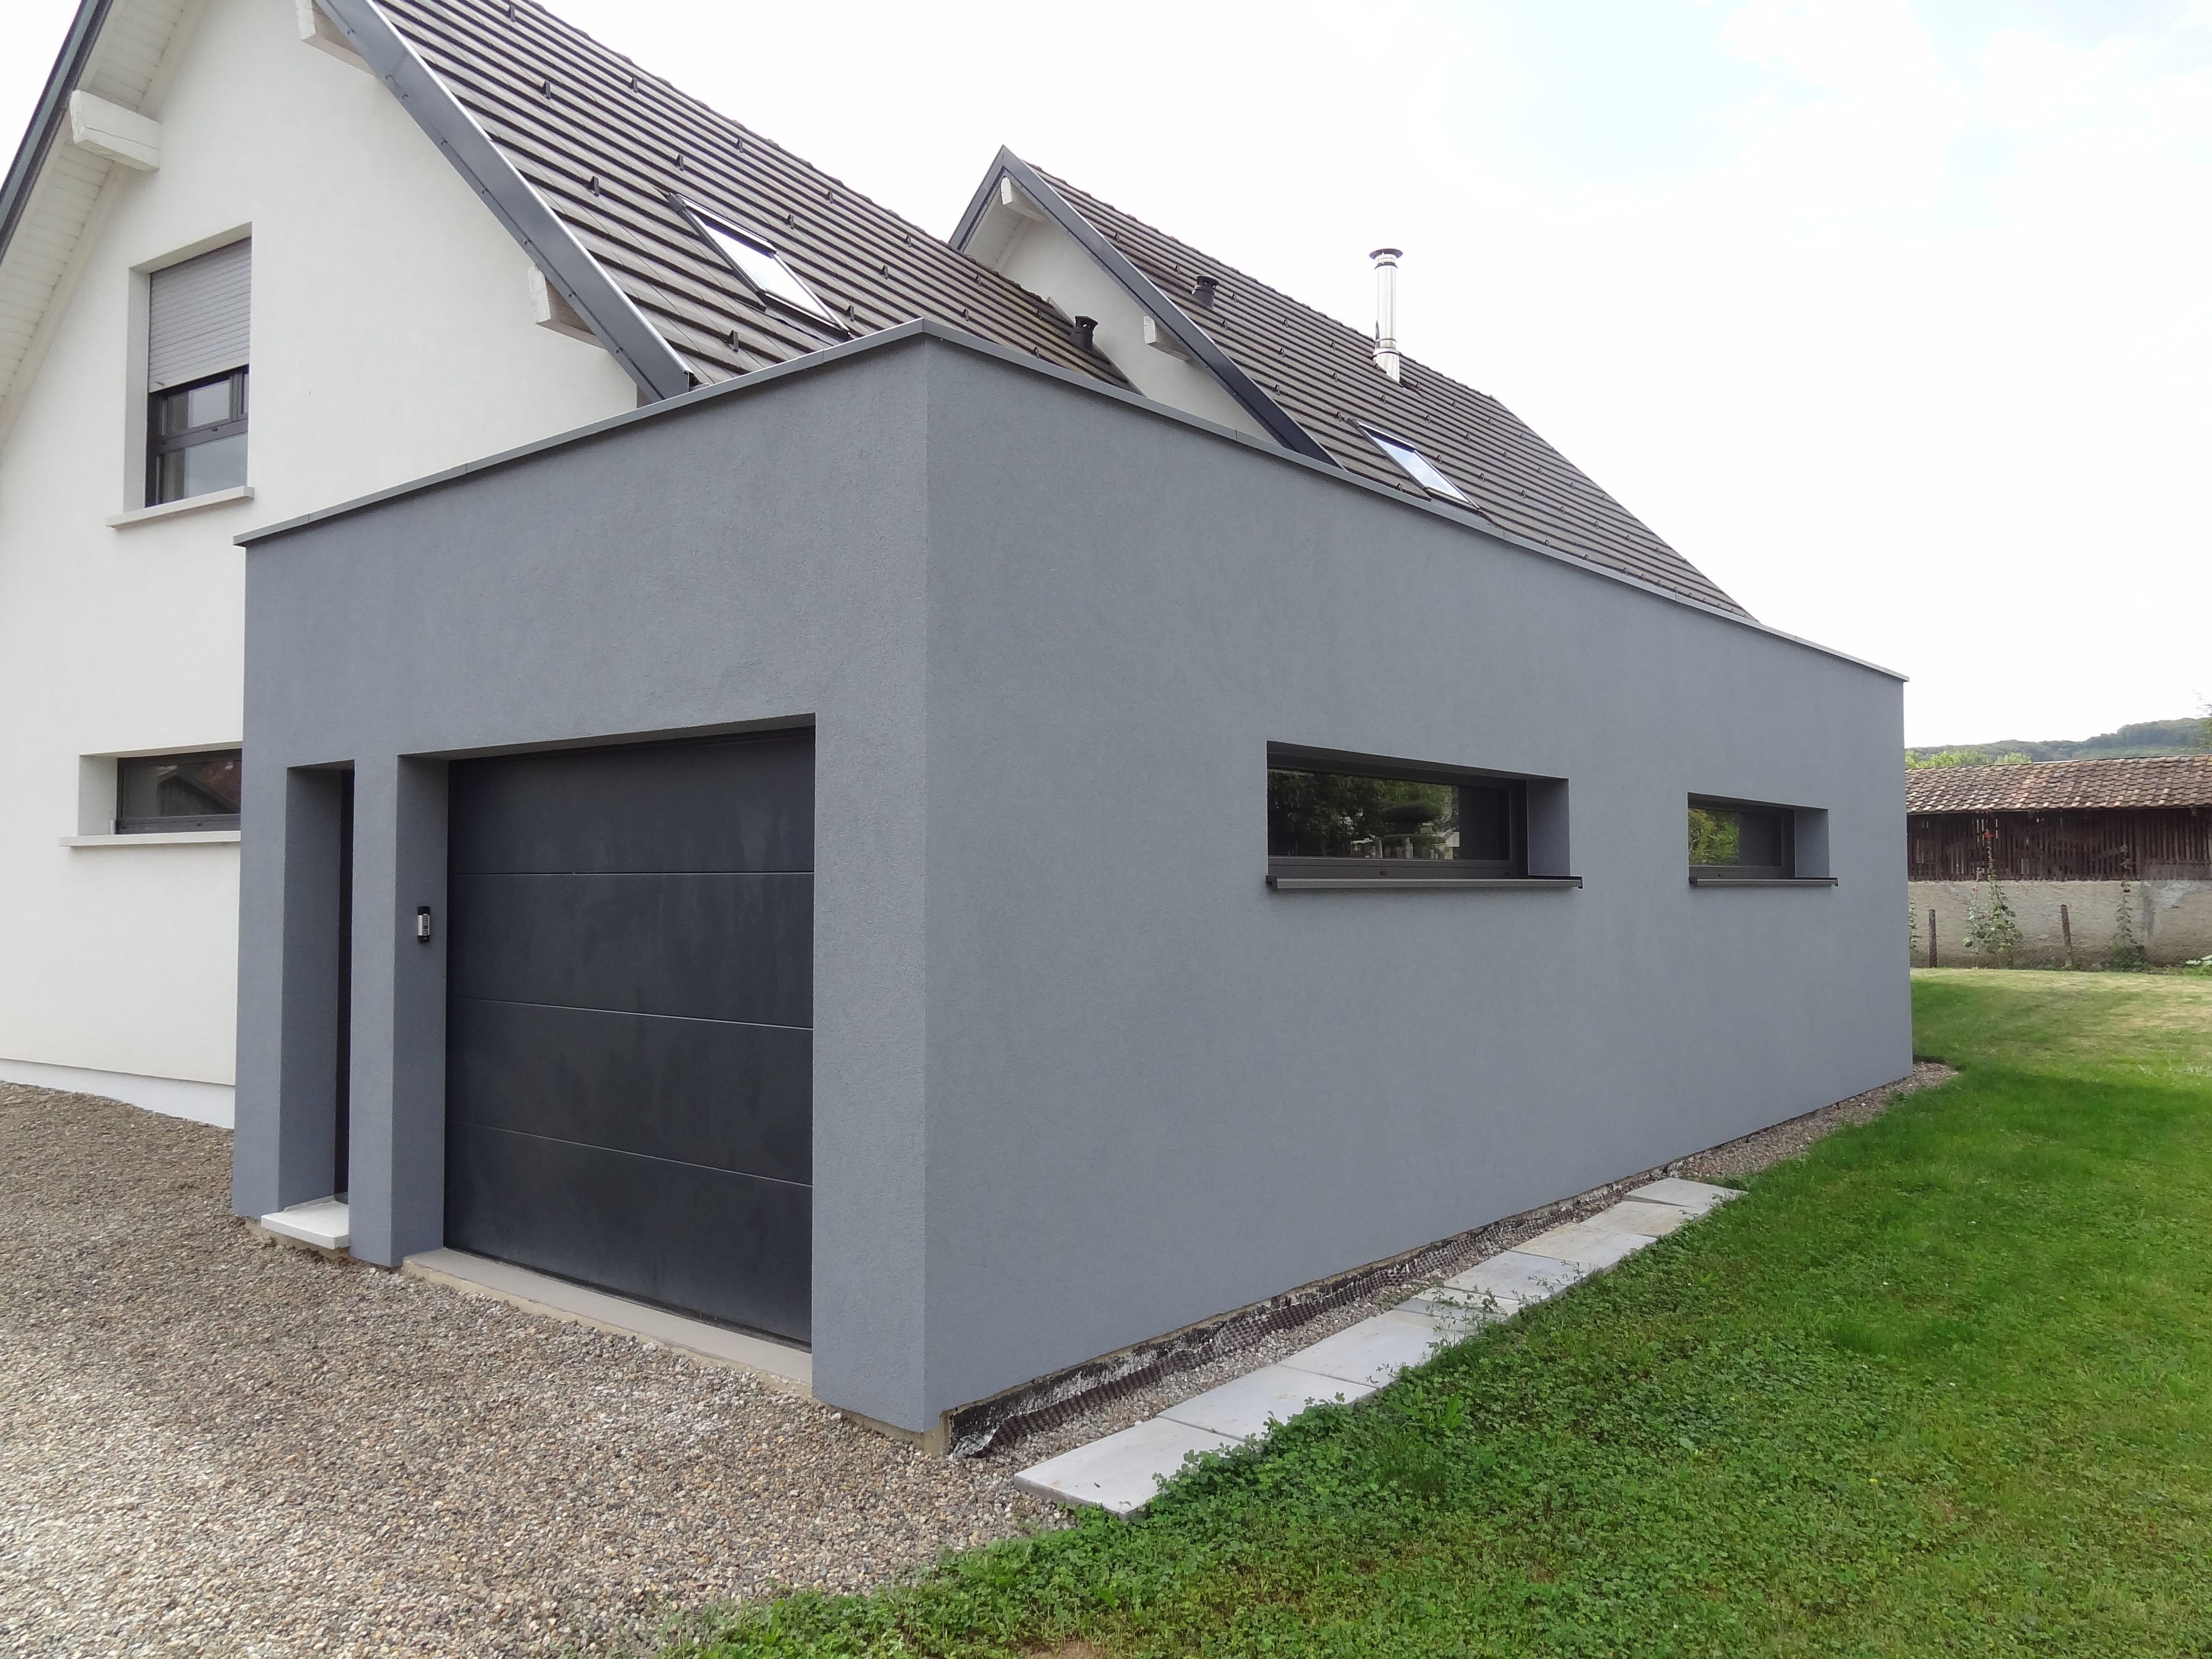 extension maison garage toit plat ventana blog. Black Bedroom Furniture Sets. Home Design Ideas